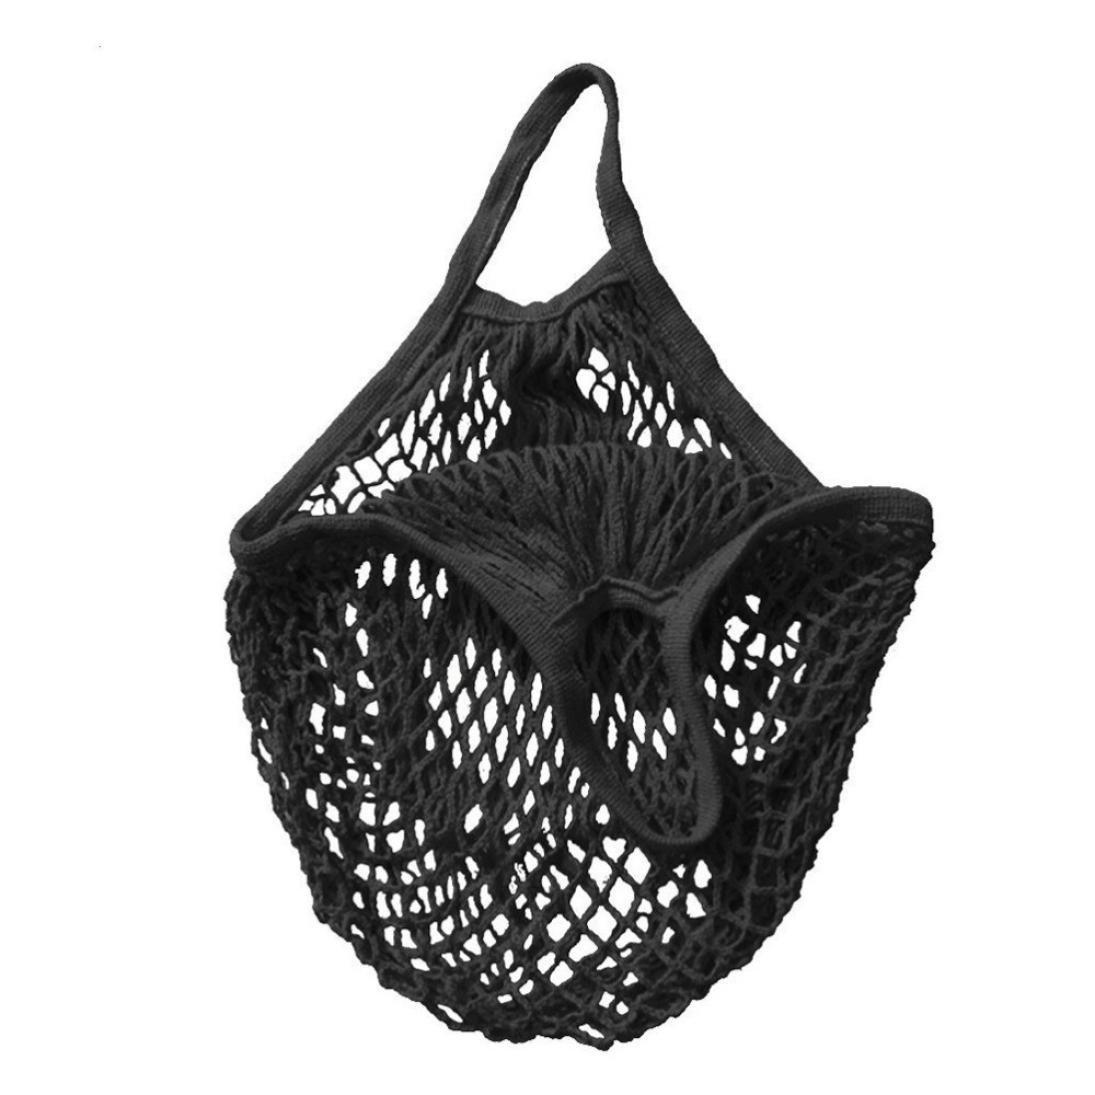 SHJNHAN Mesh Net Turtle Bag, String Shopping Bag Reusable Fruit Storage Handbag Totes New (Black)